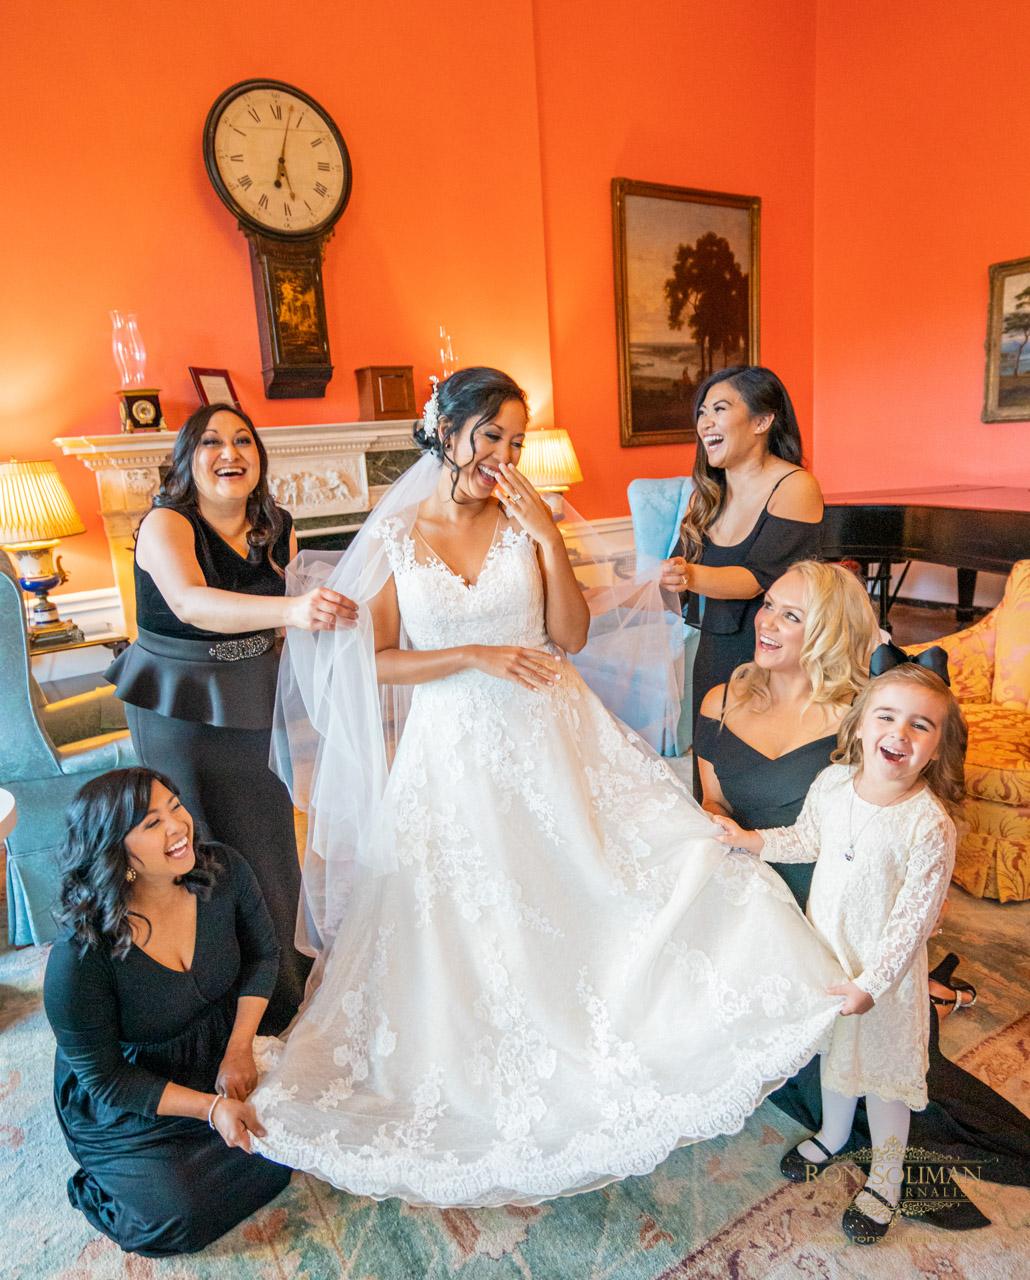 THE GREENBRIER RESORT WEDDING 11